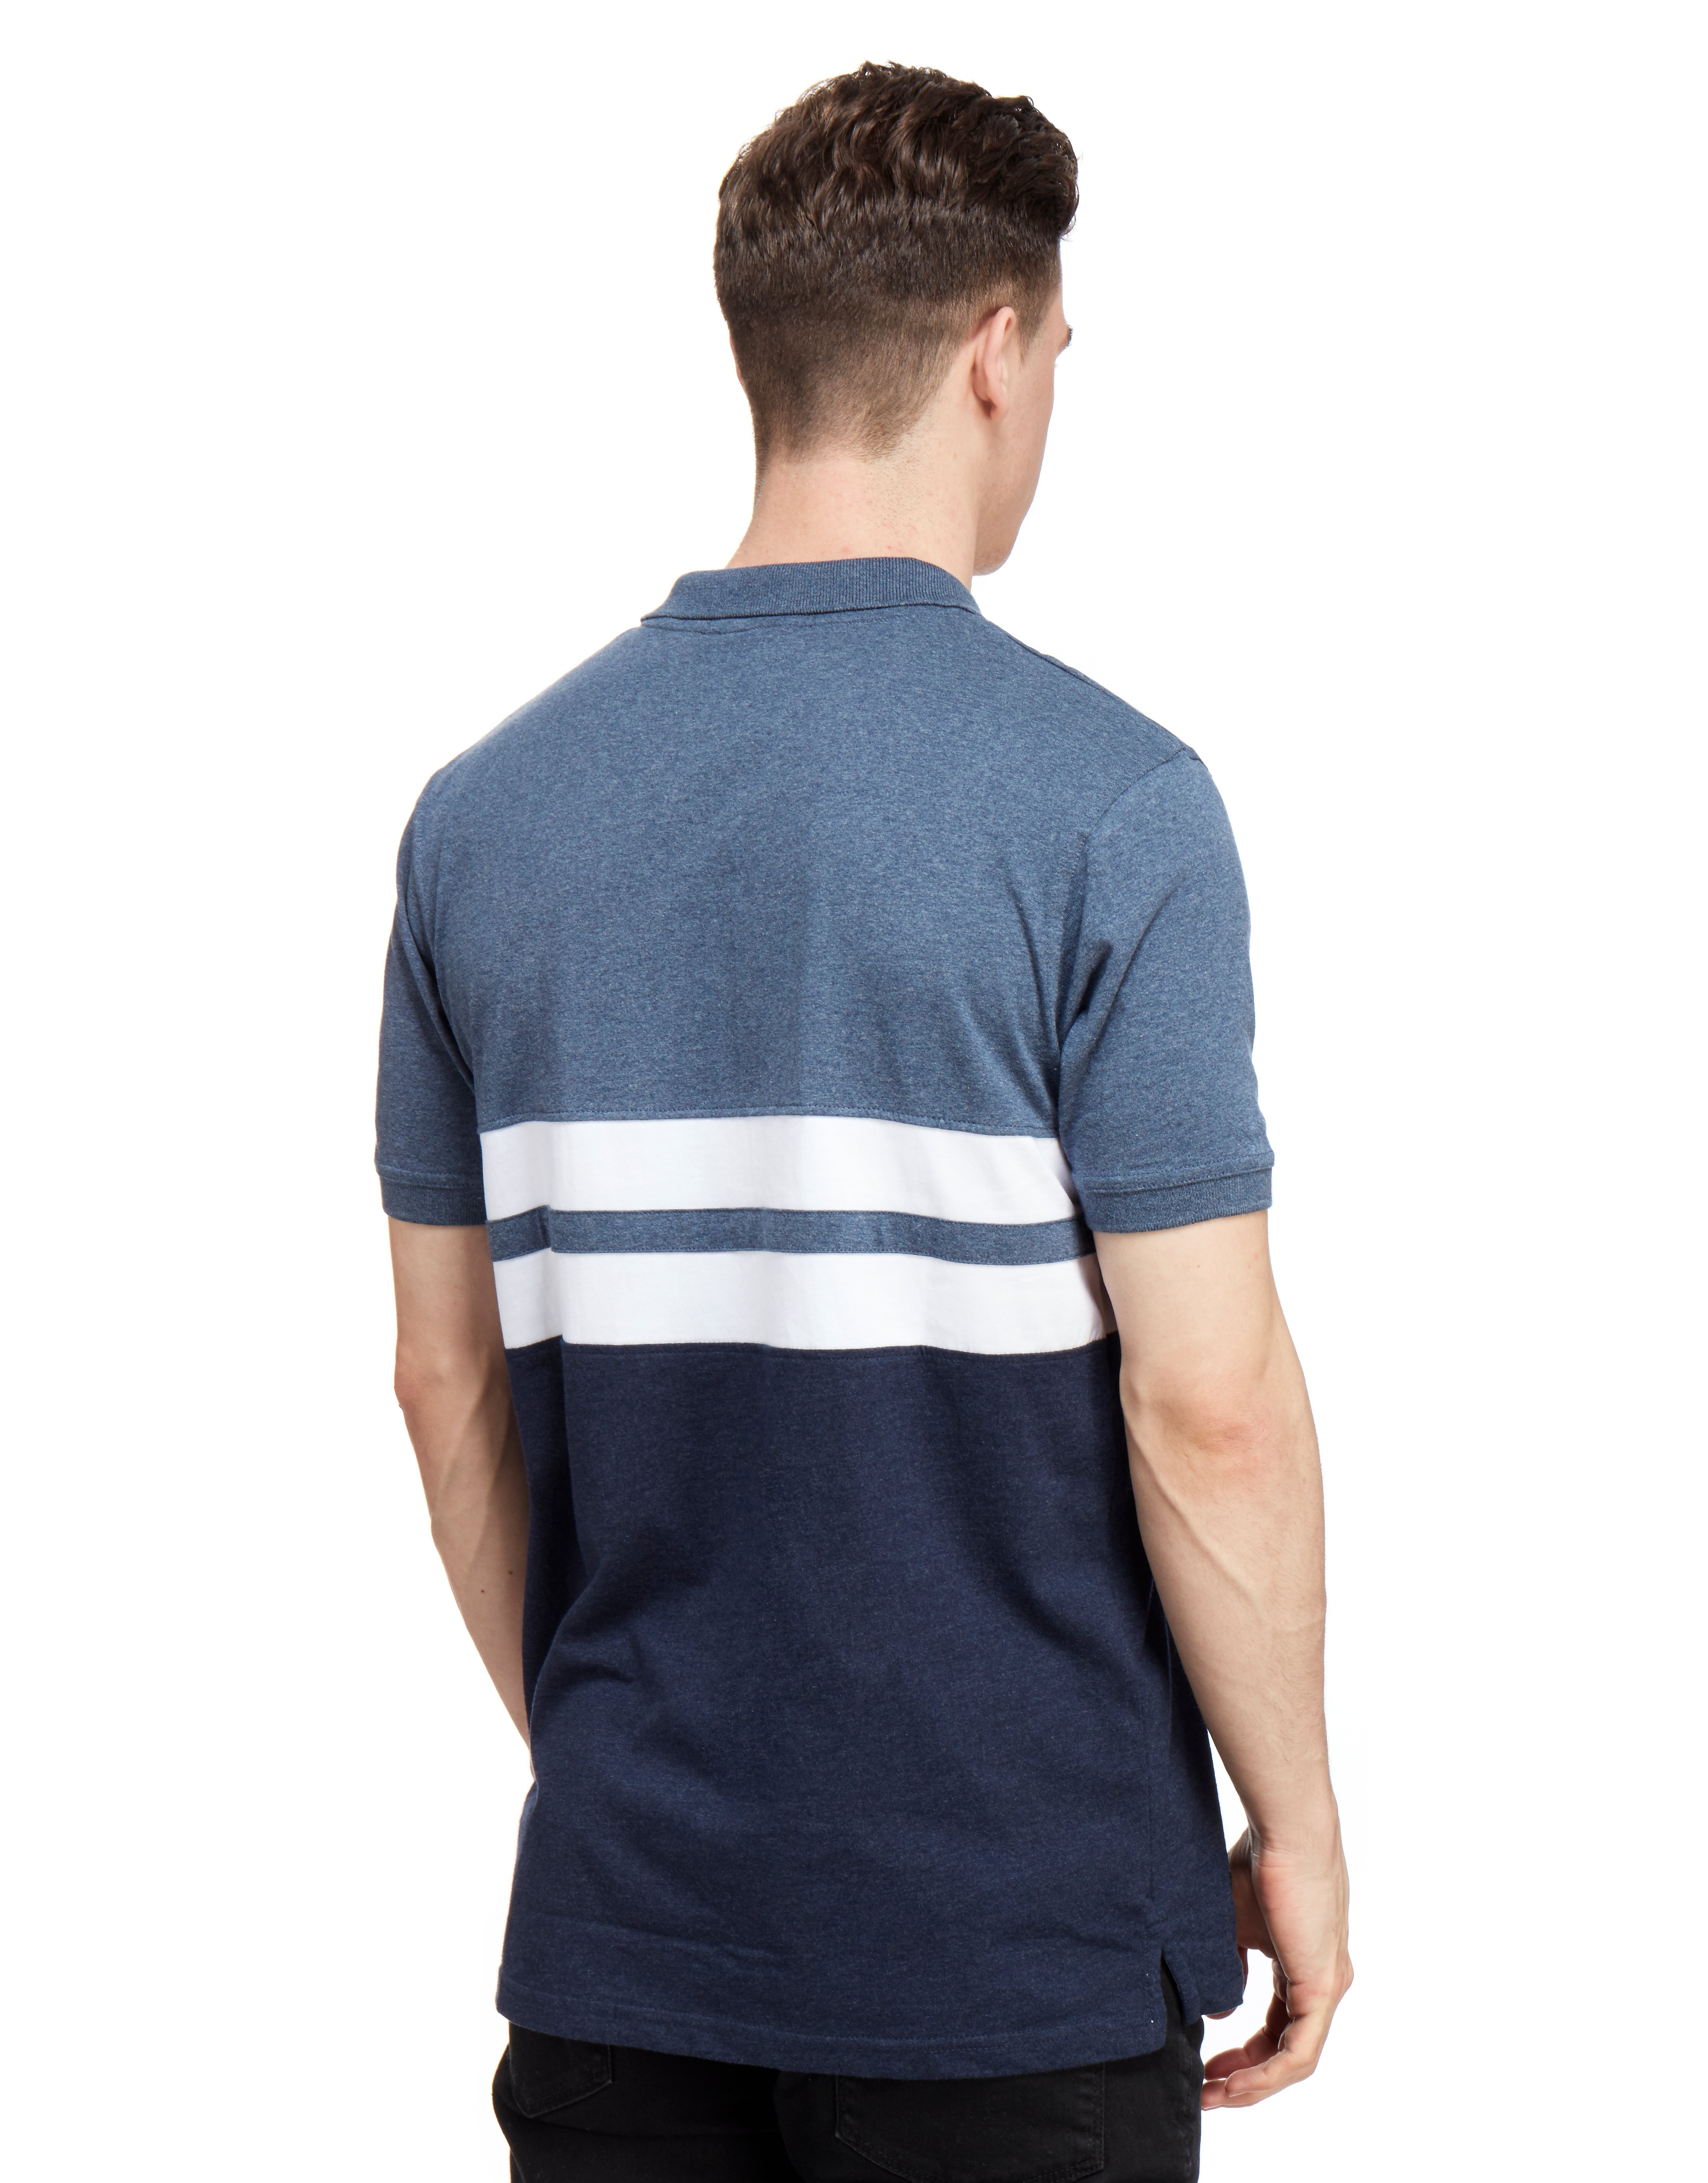 McKenzie Braemar Polo Shirt